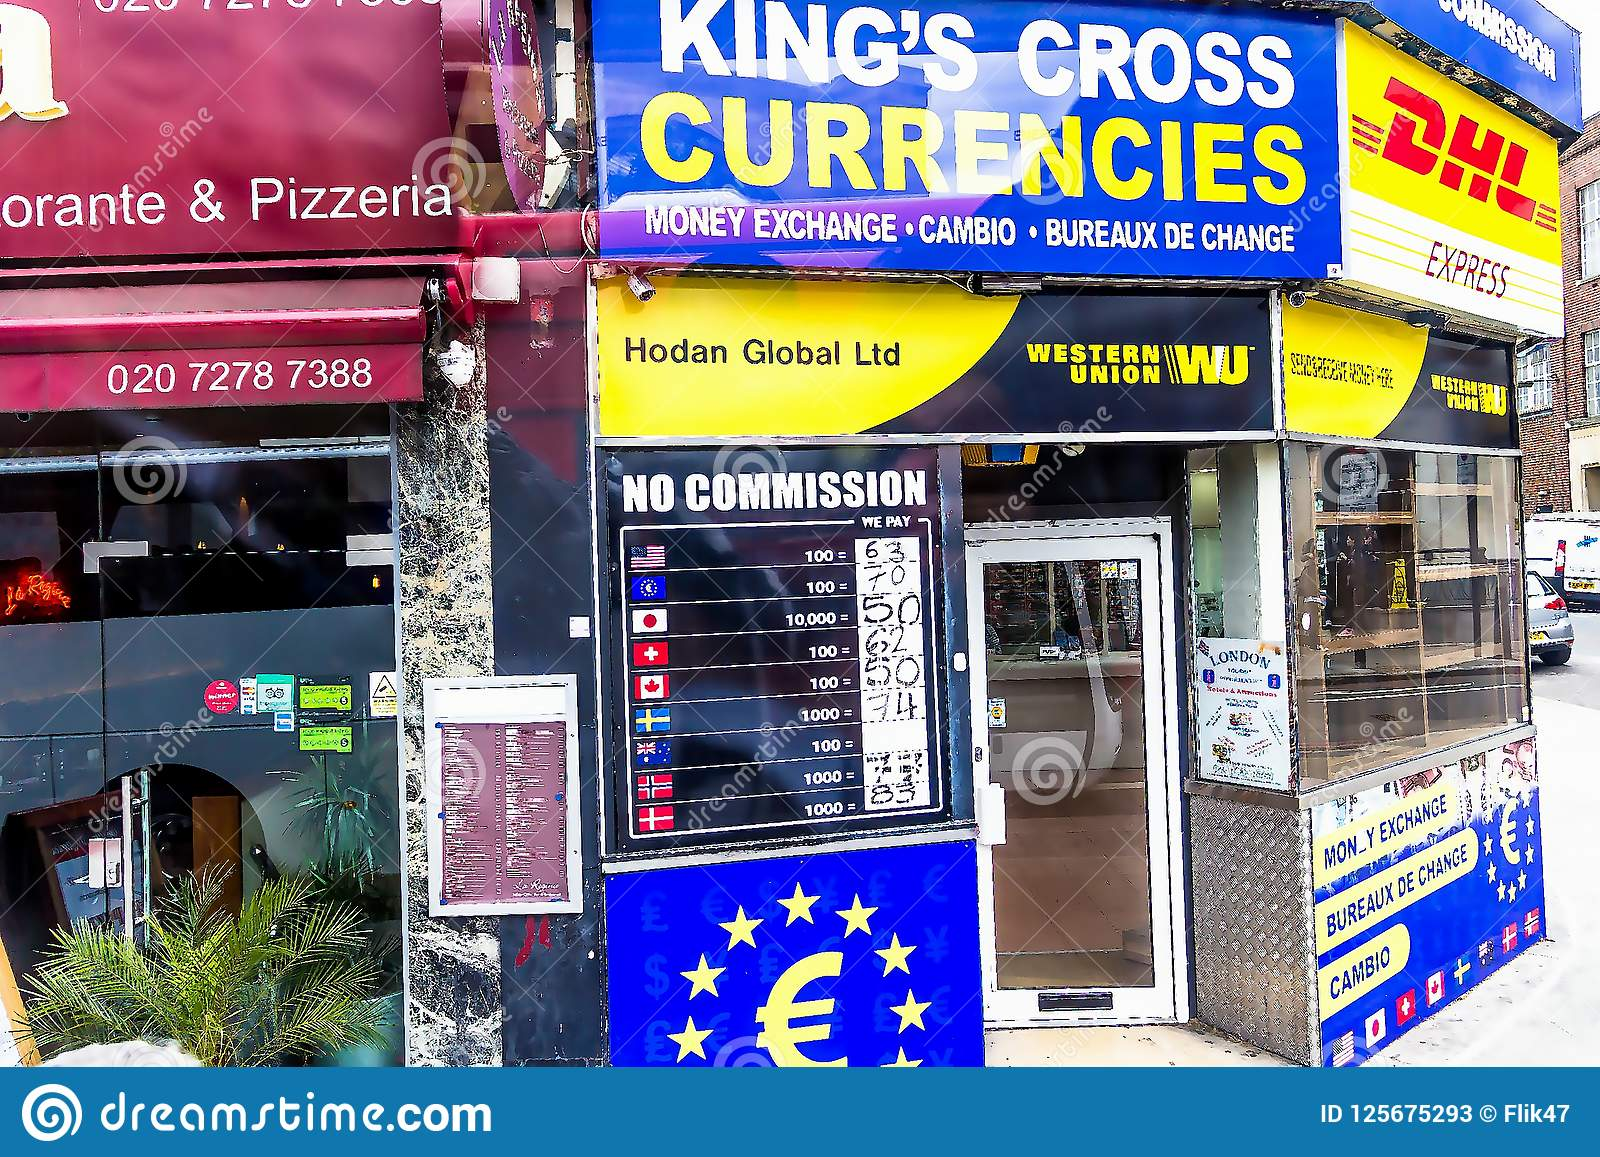 Currency exchange bureau king cross currencies editorial stock photo